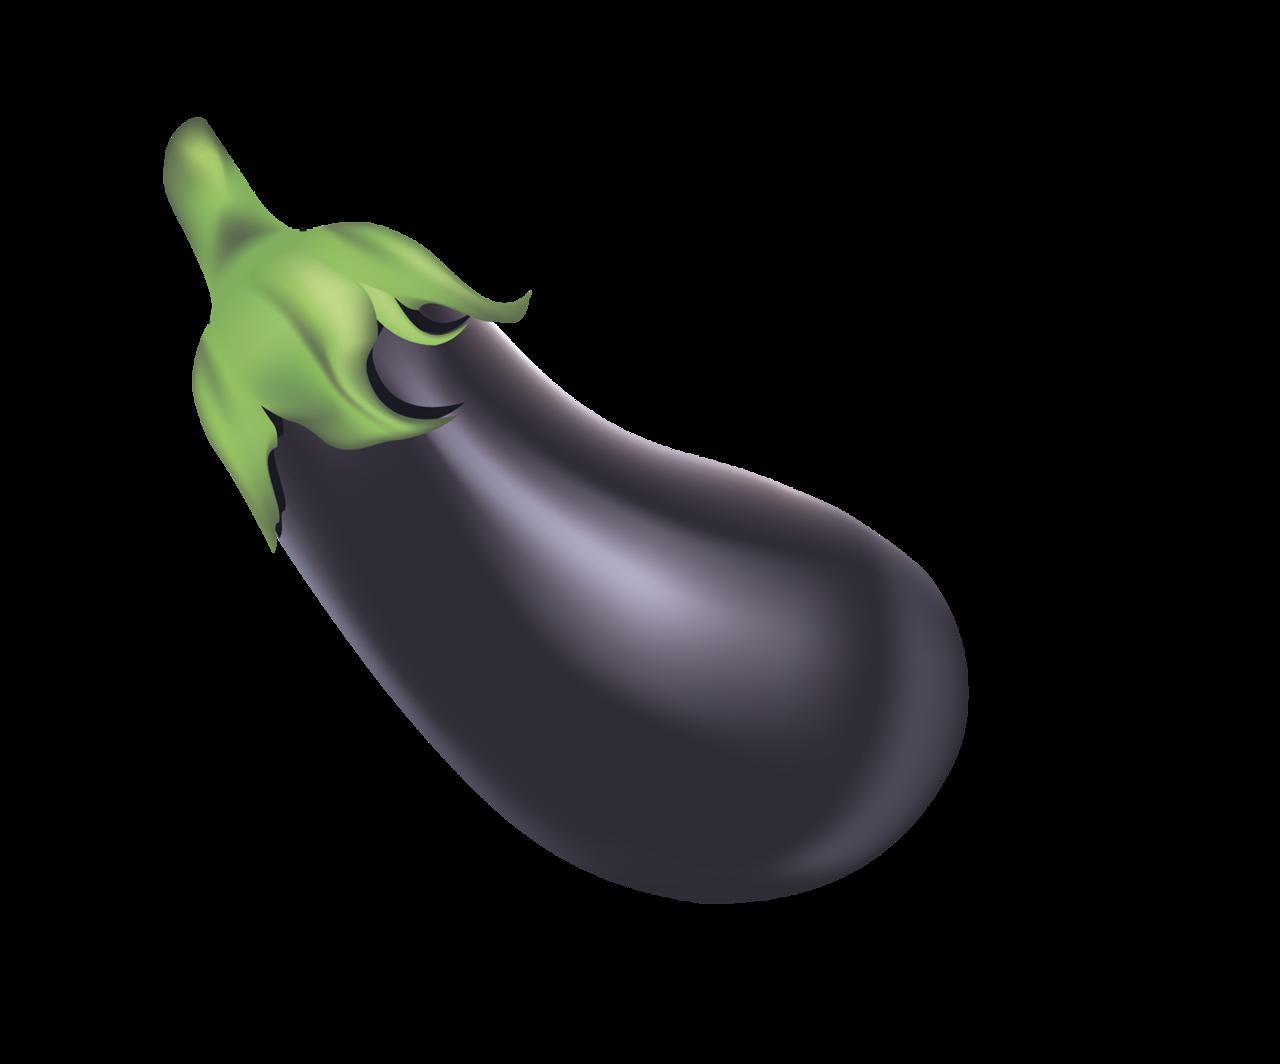 Eggplant Png Image Eggplant Png Images Image